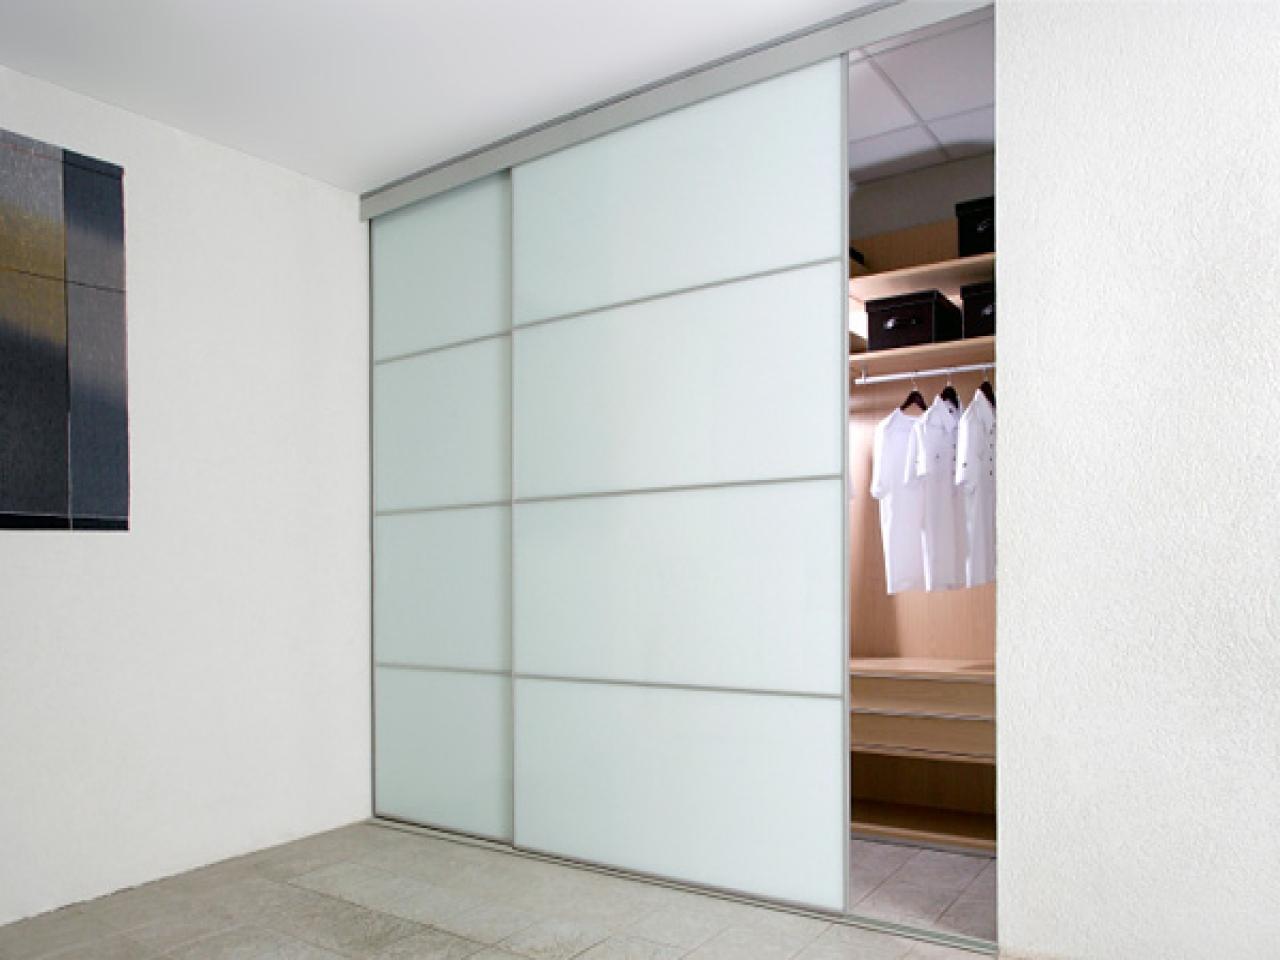 Interior Sliding Closet Doors Lowes Hawk Haven